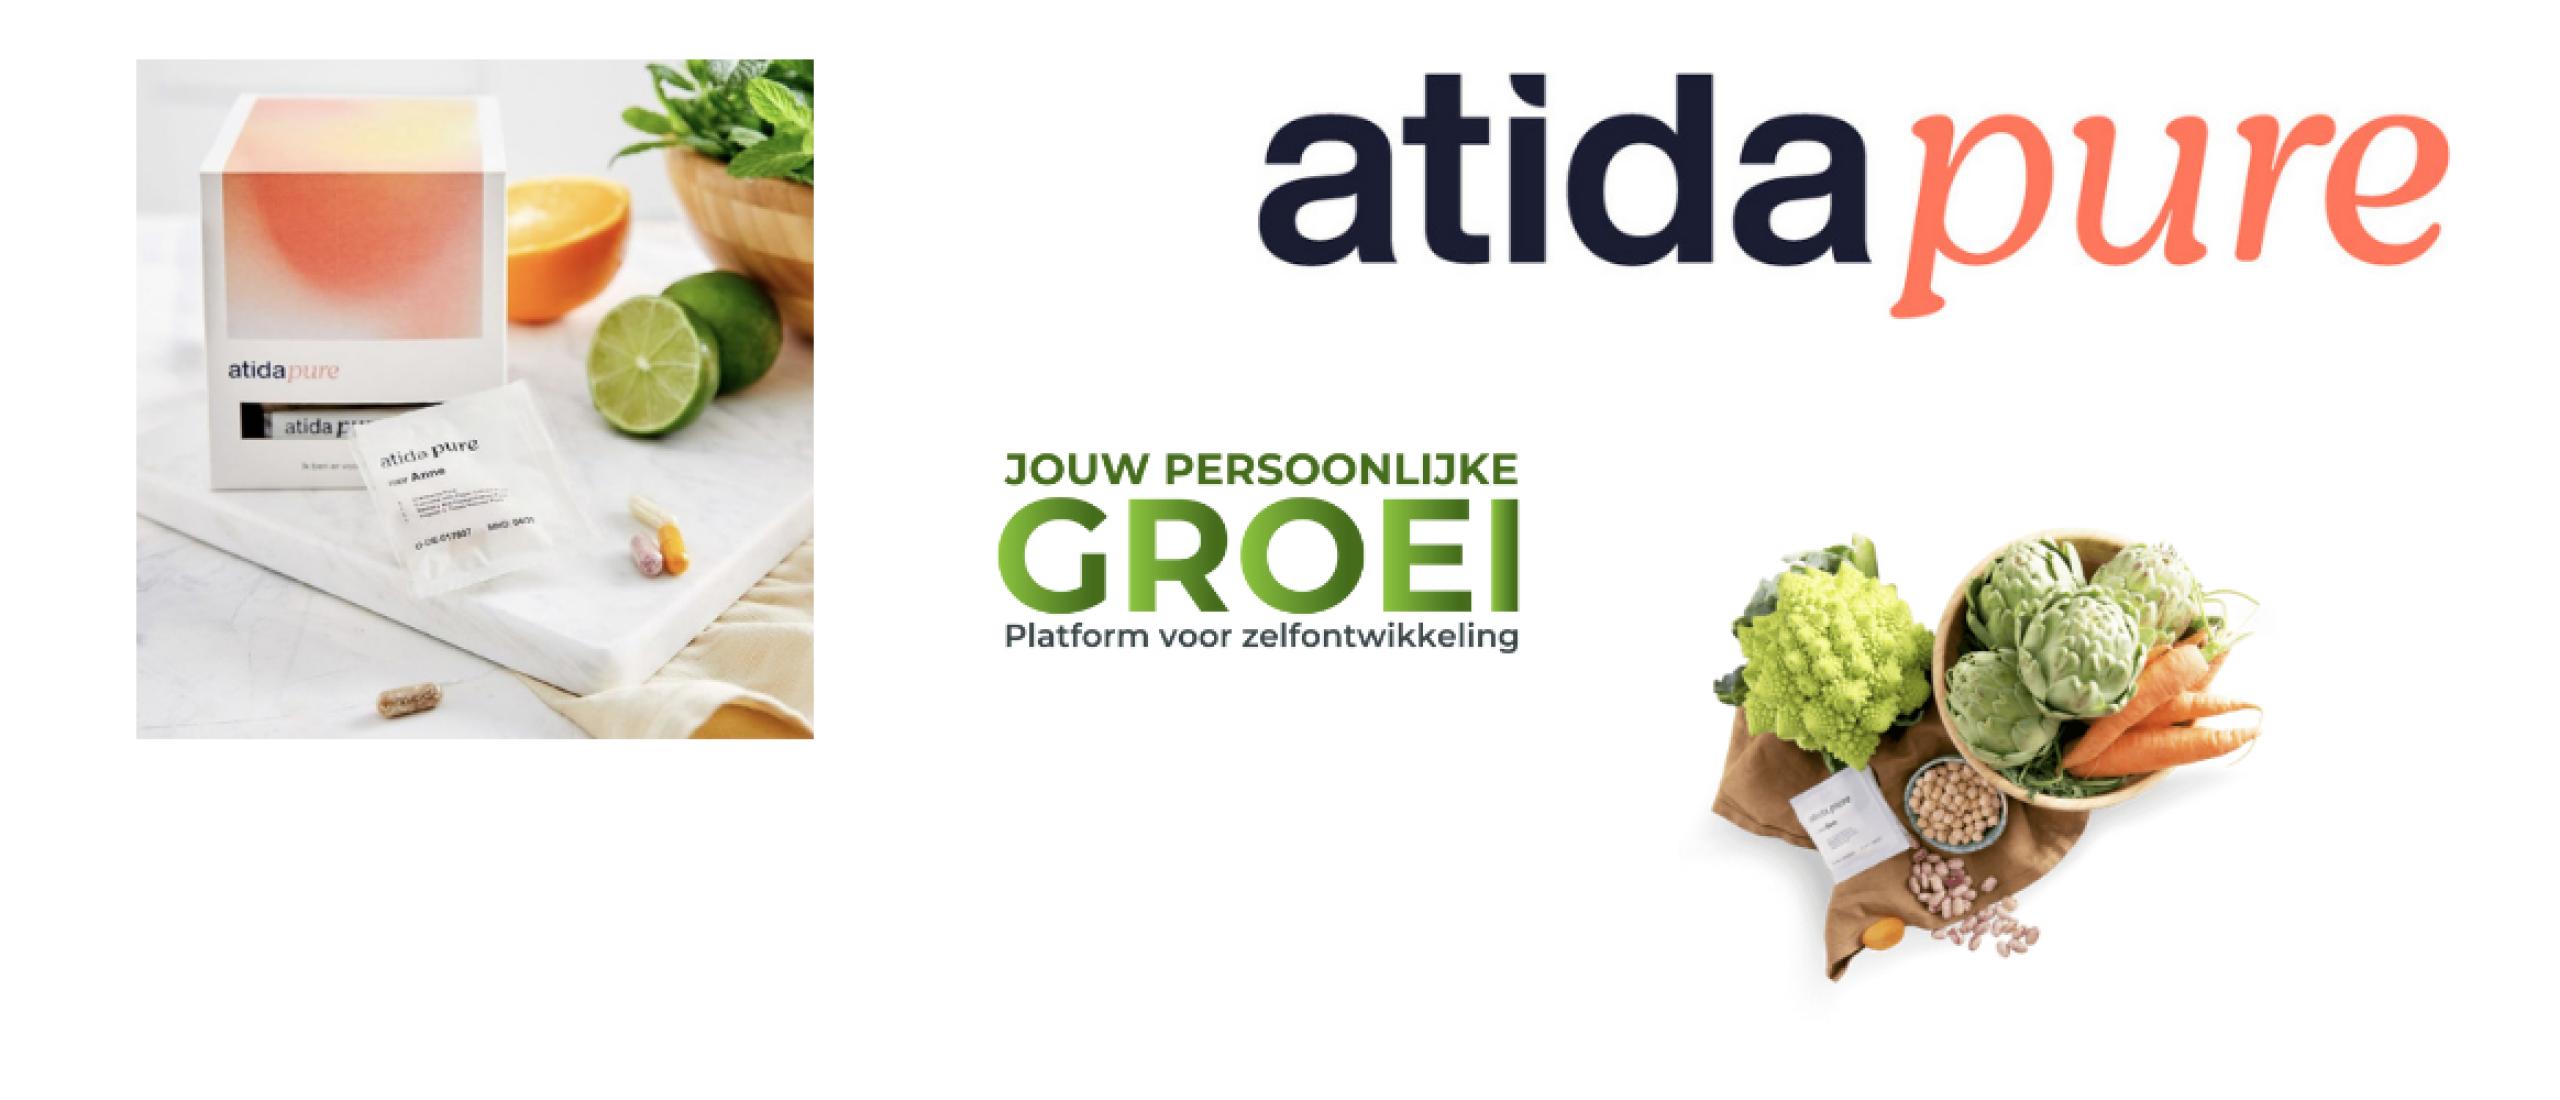 Atida Pure | Review (2021) + Korting | Gepersonaliseerd & flexibel